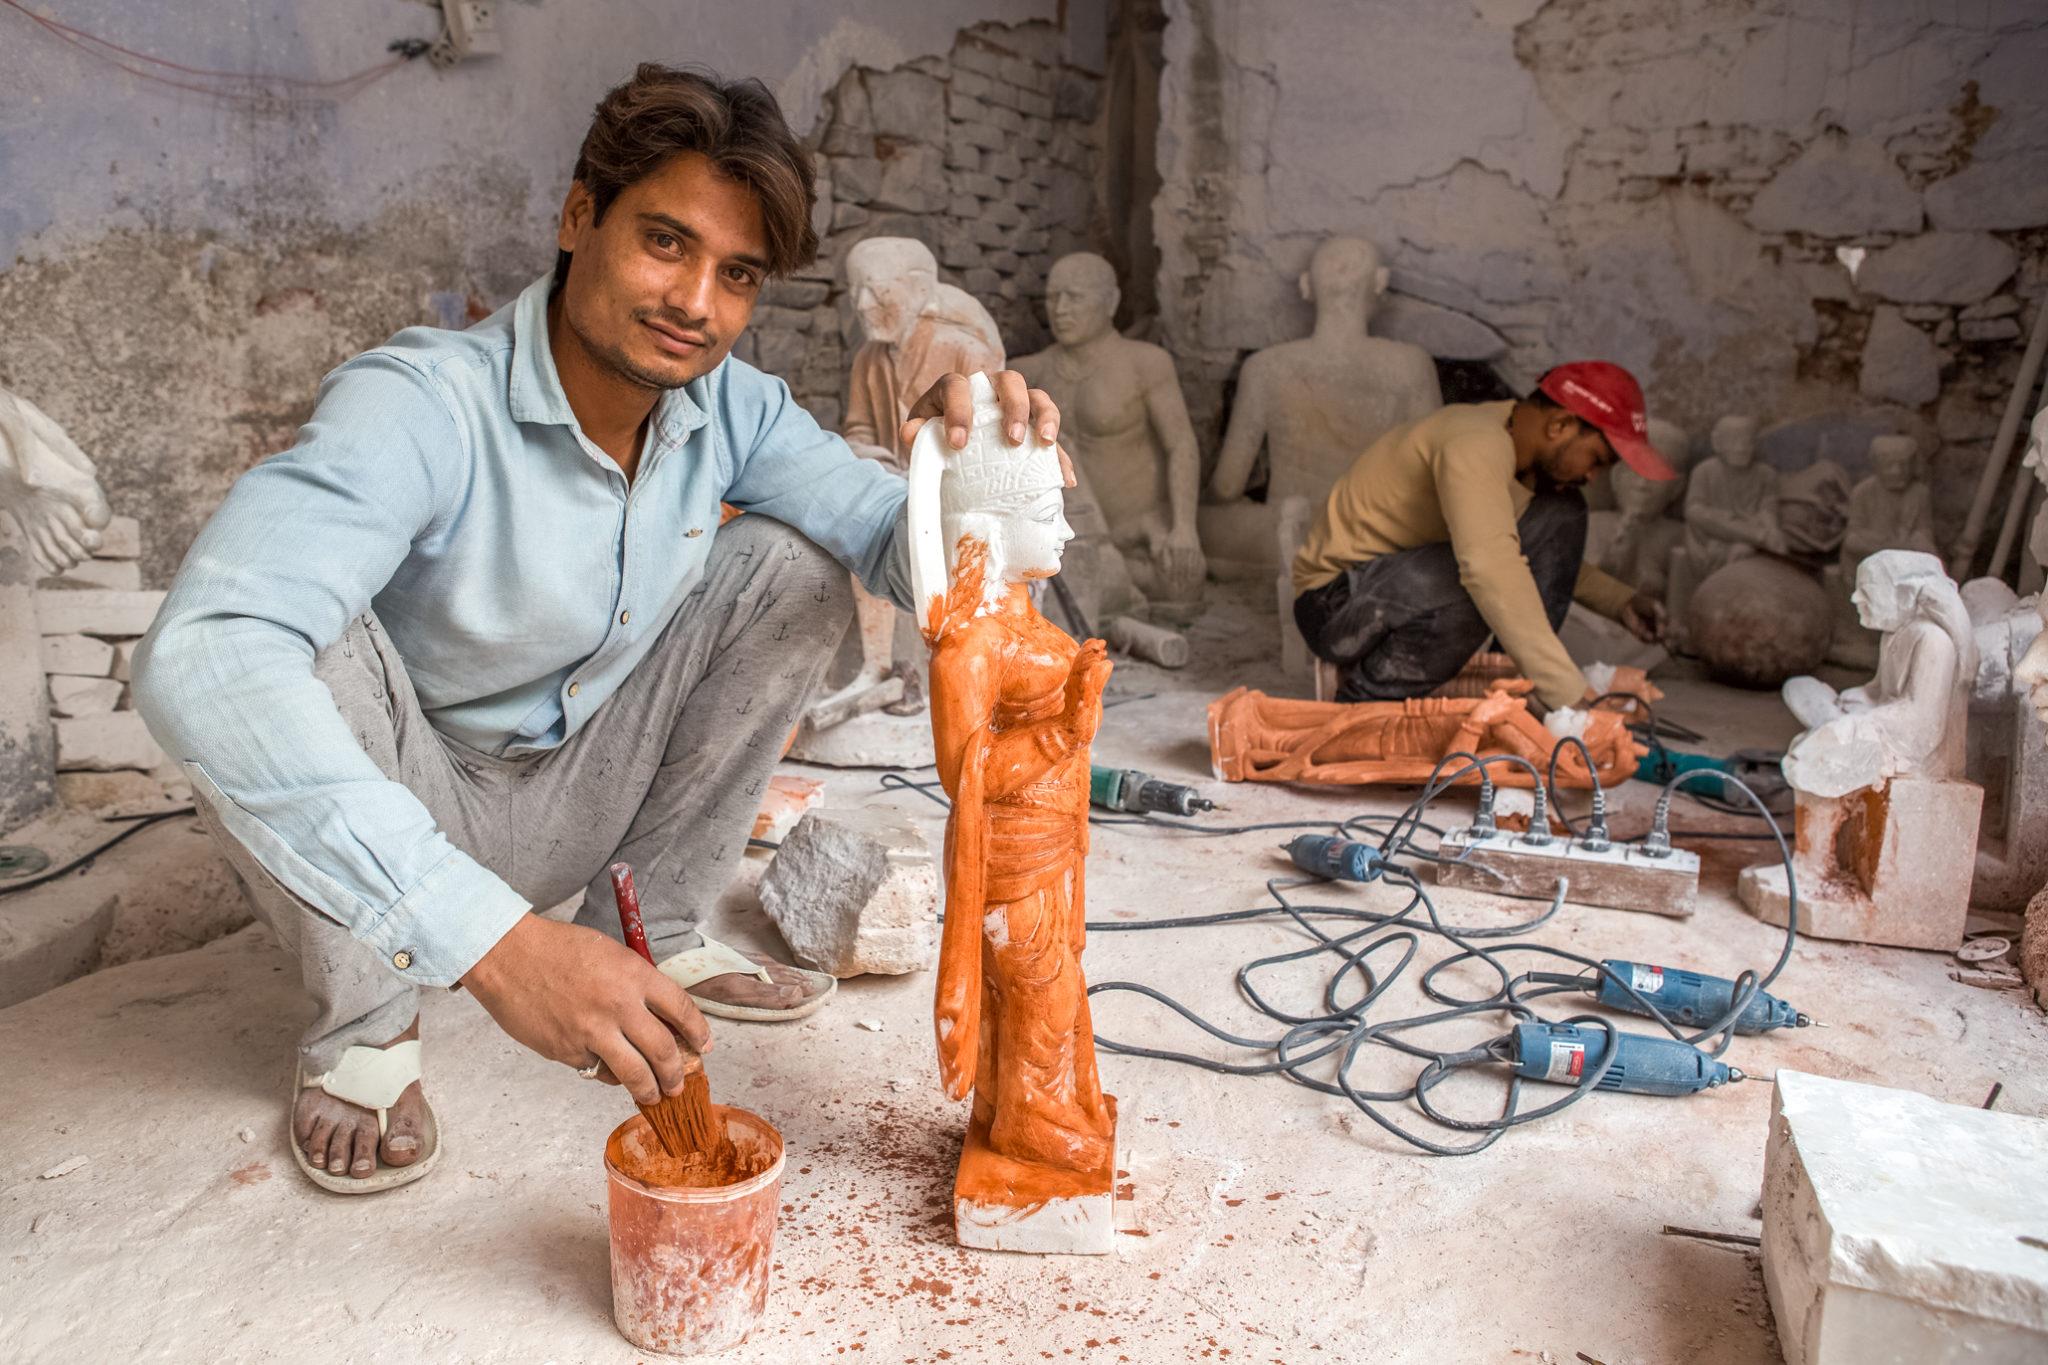 jaipur-visite-artisanat-vélo-inde